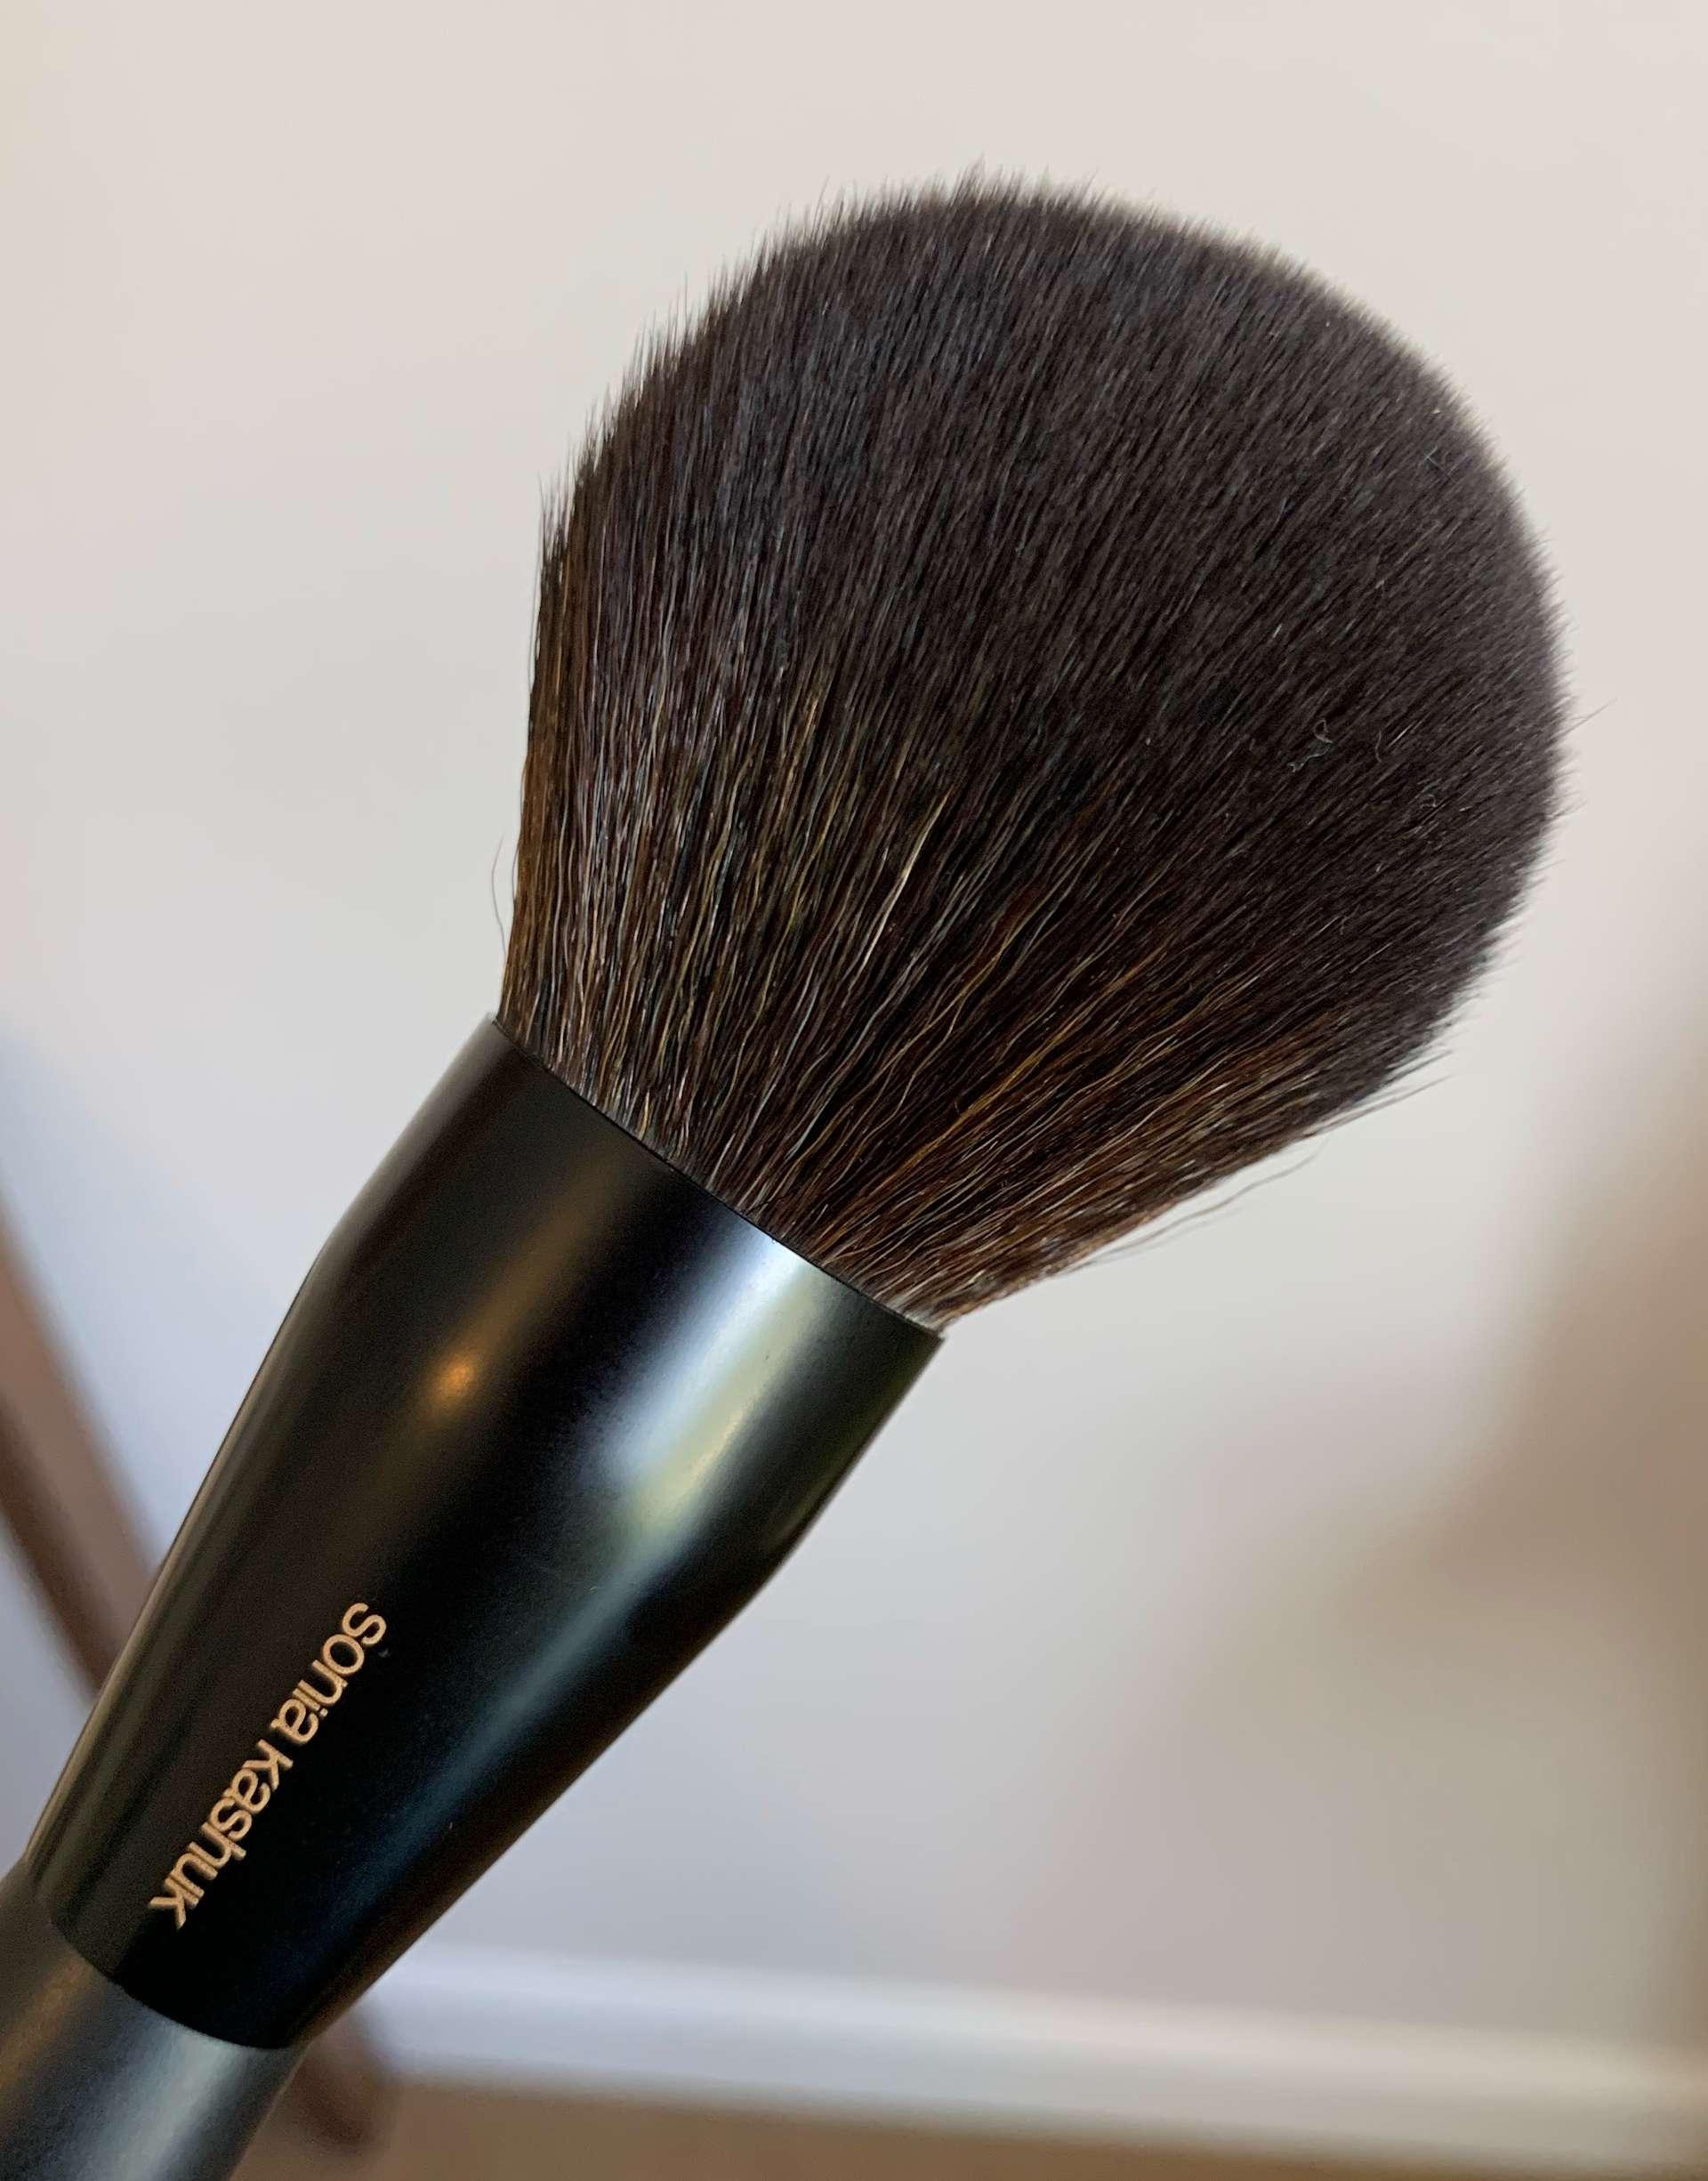 Sonia Kashuk Professional Collection large powder brush